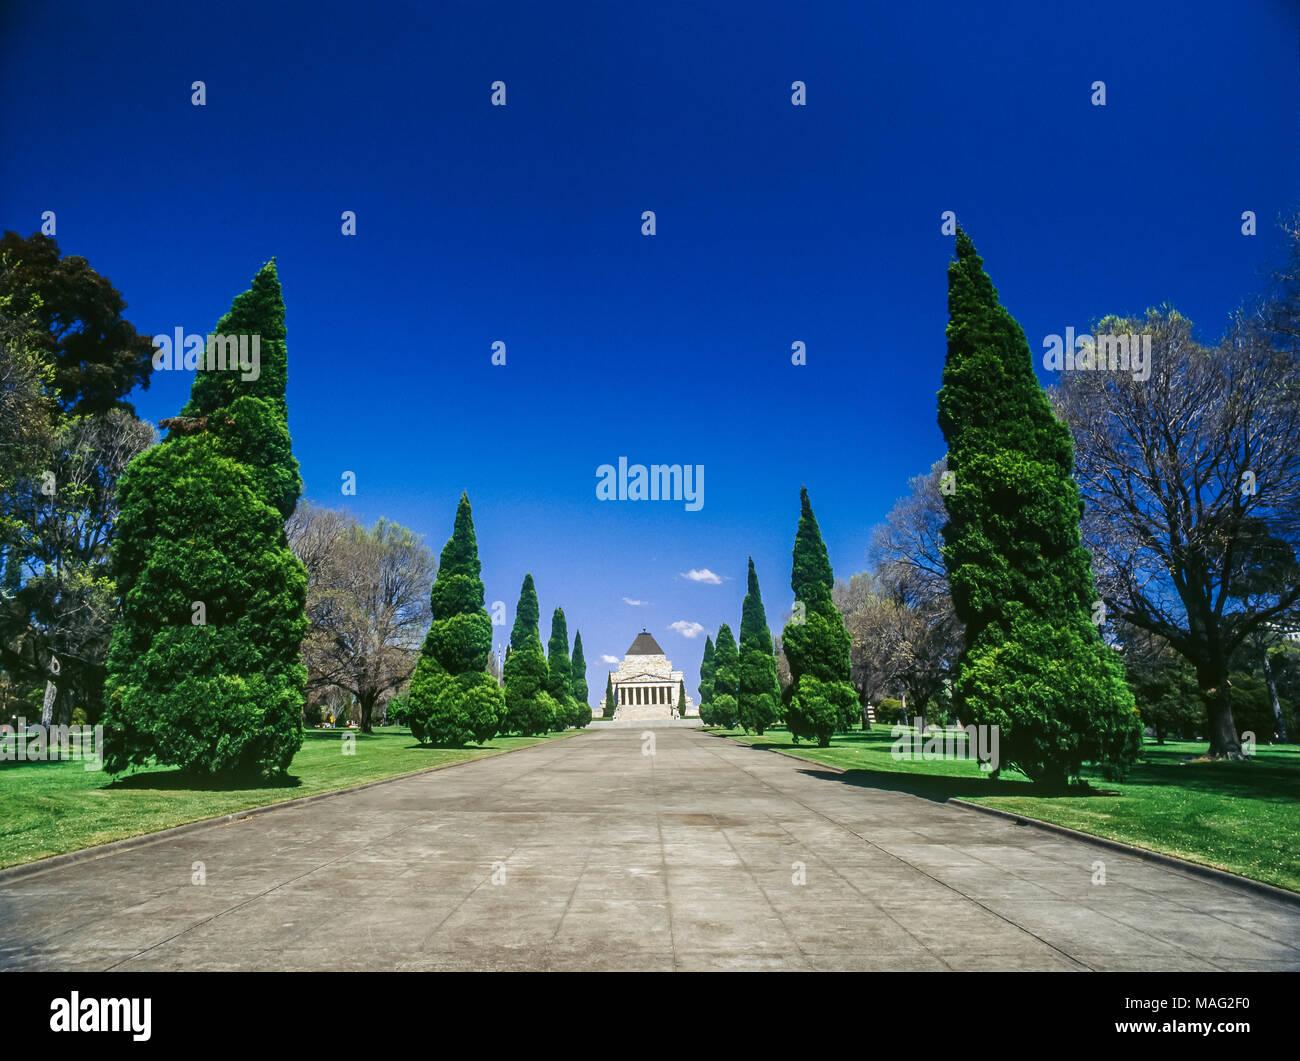 Ceremonial Avenue, leading to the Shrine of Remembrance, Melbourne, Victoria, Australia - Stock Image